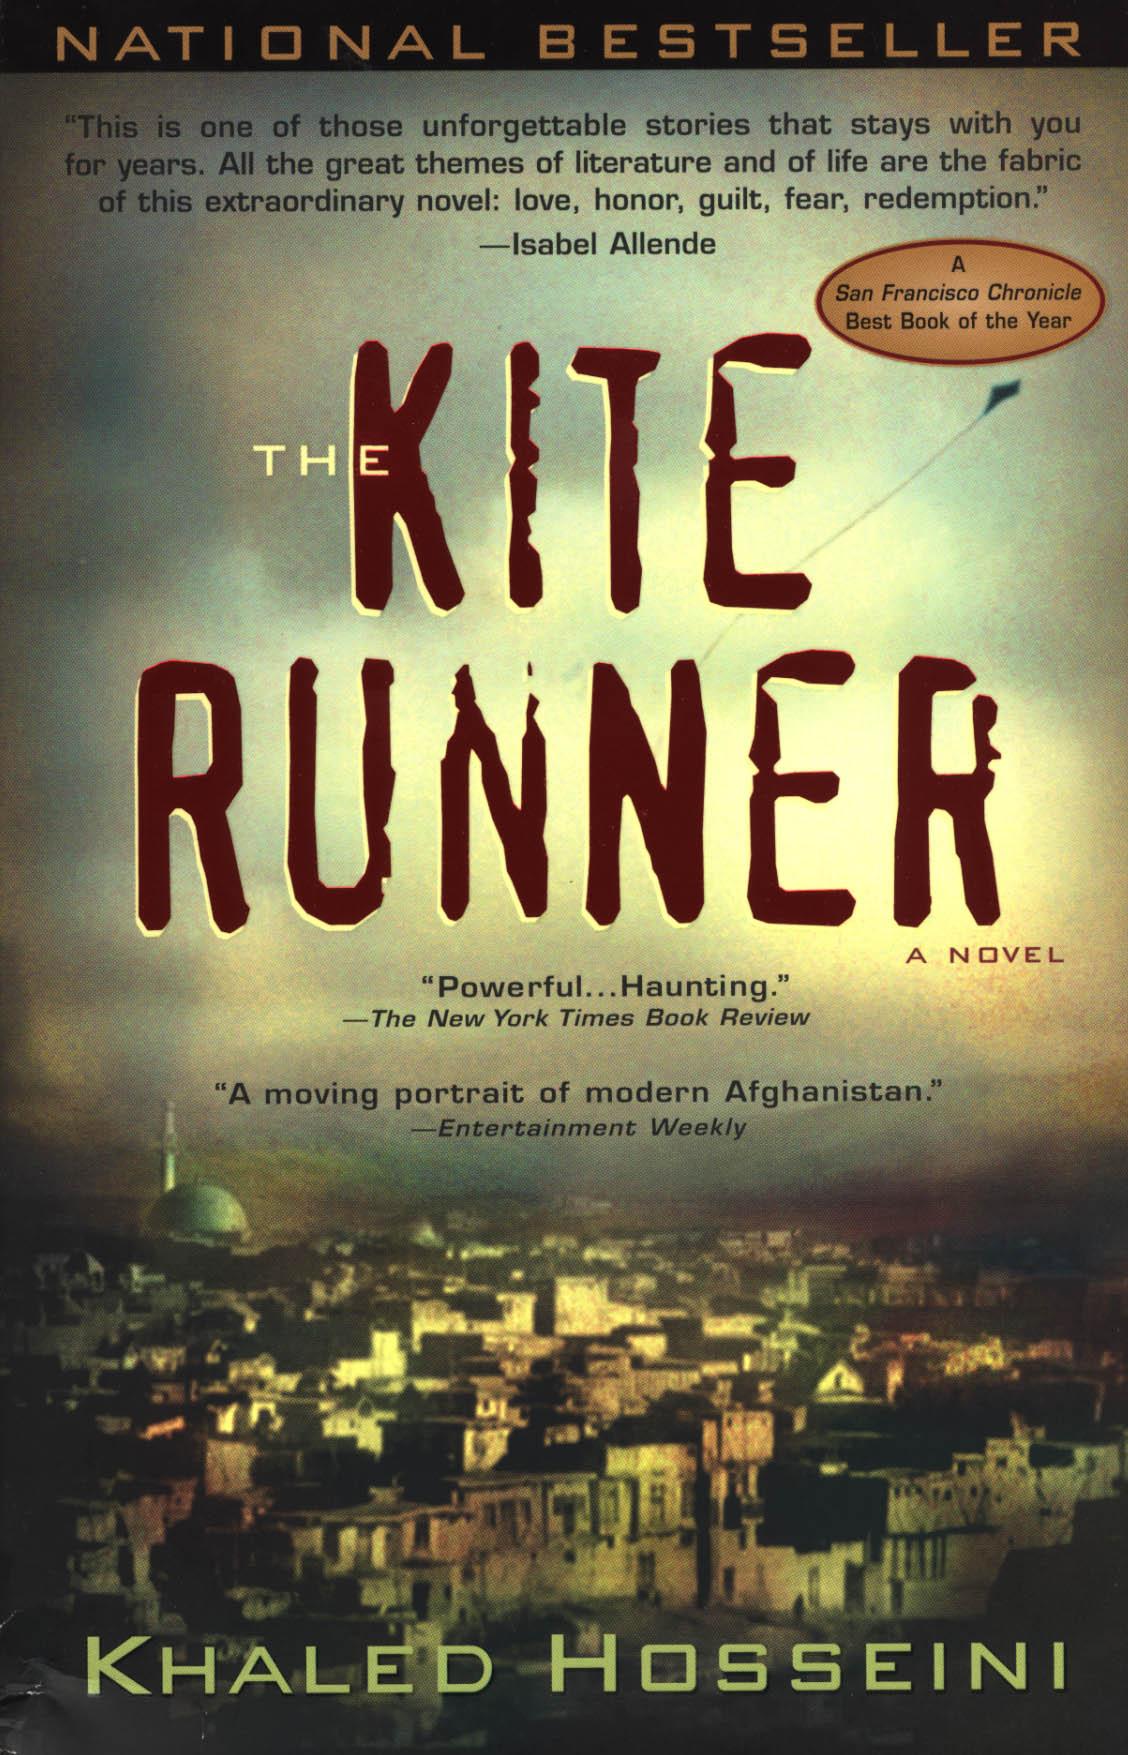 literary criticism on the kite runner